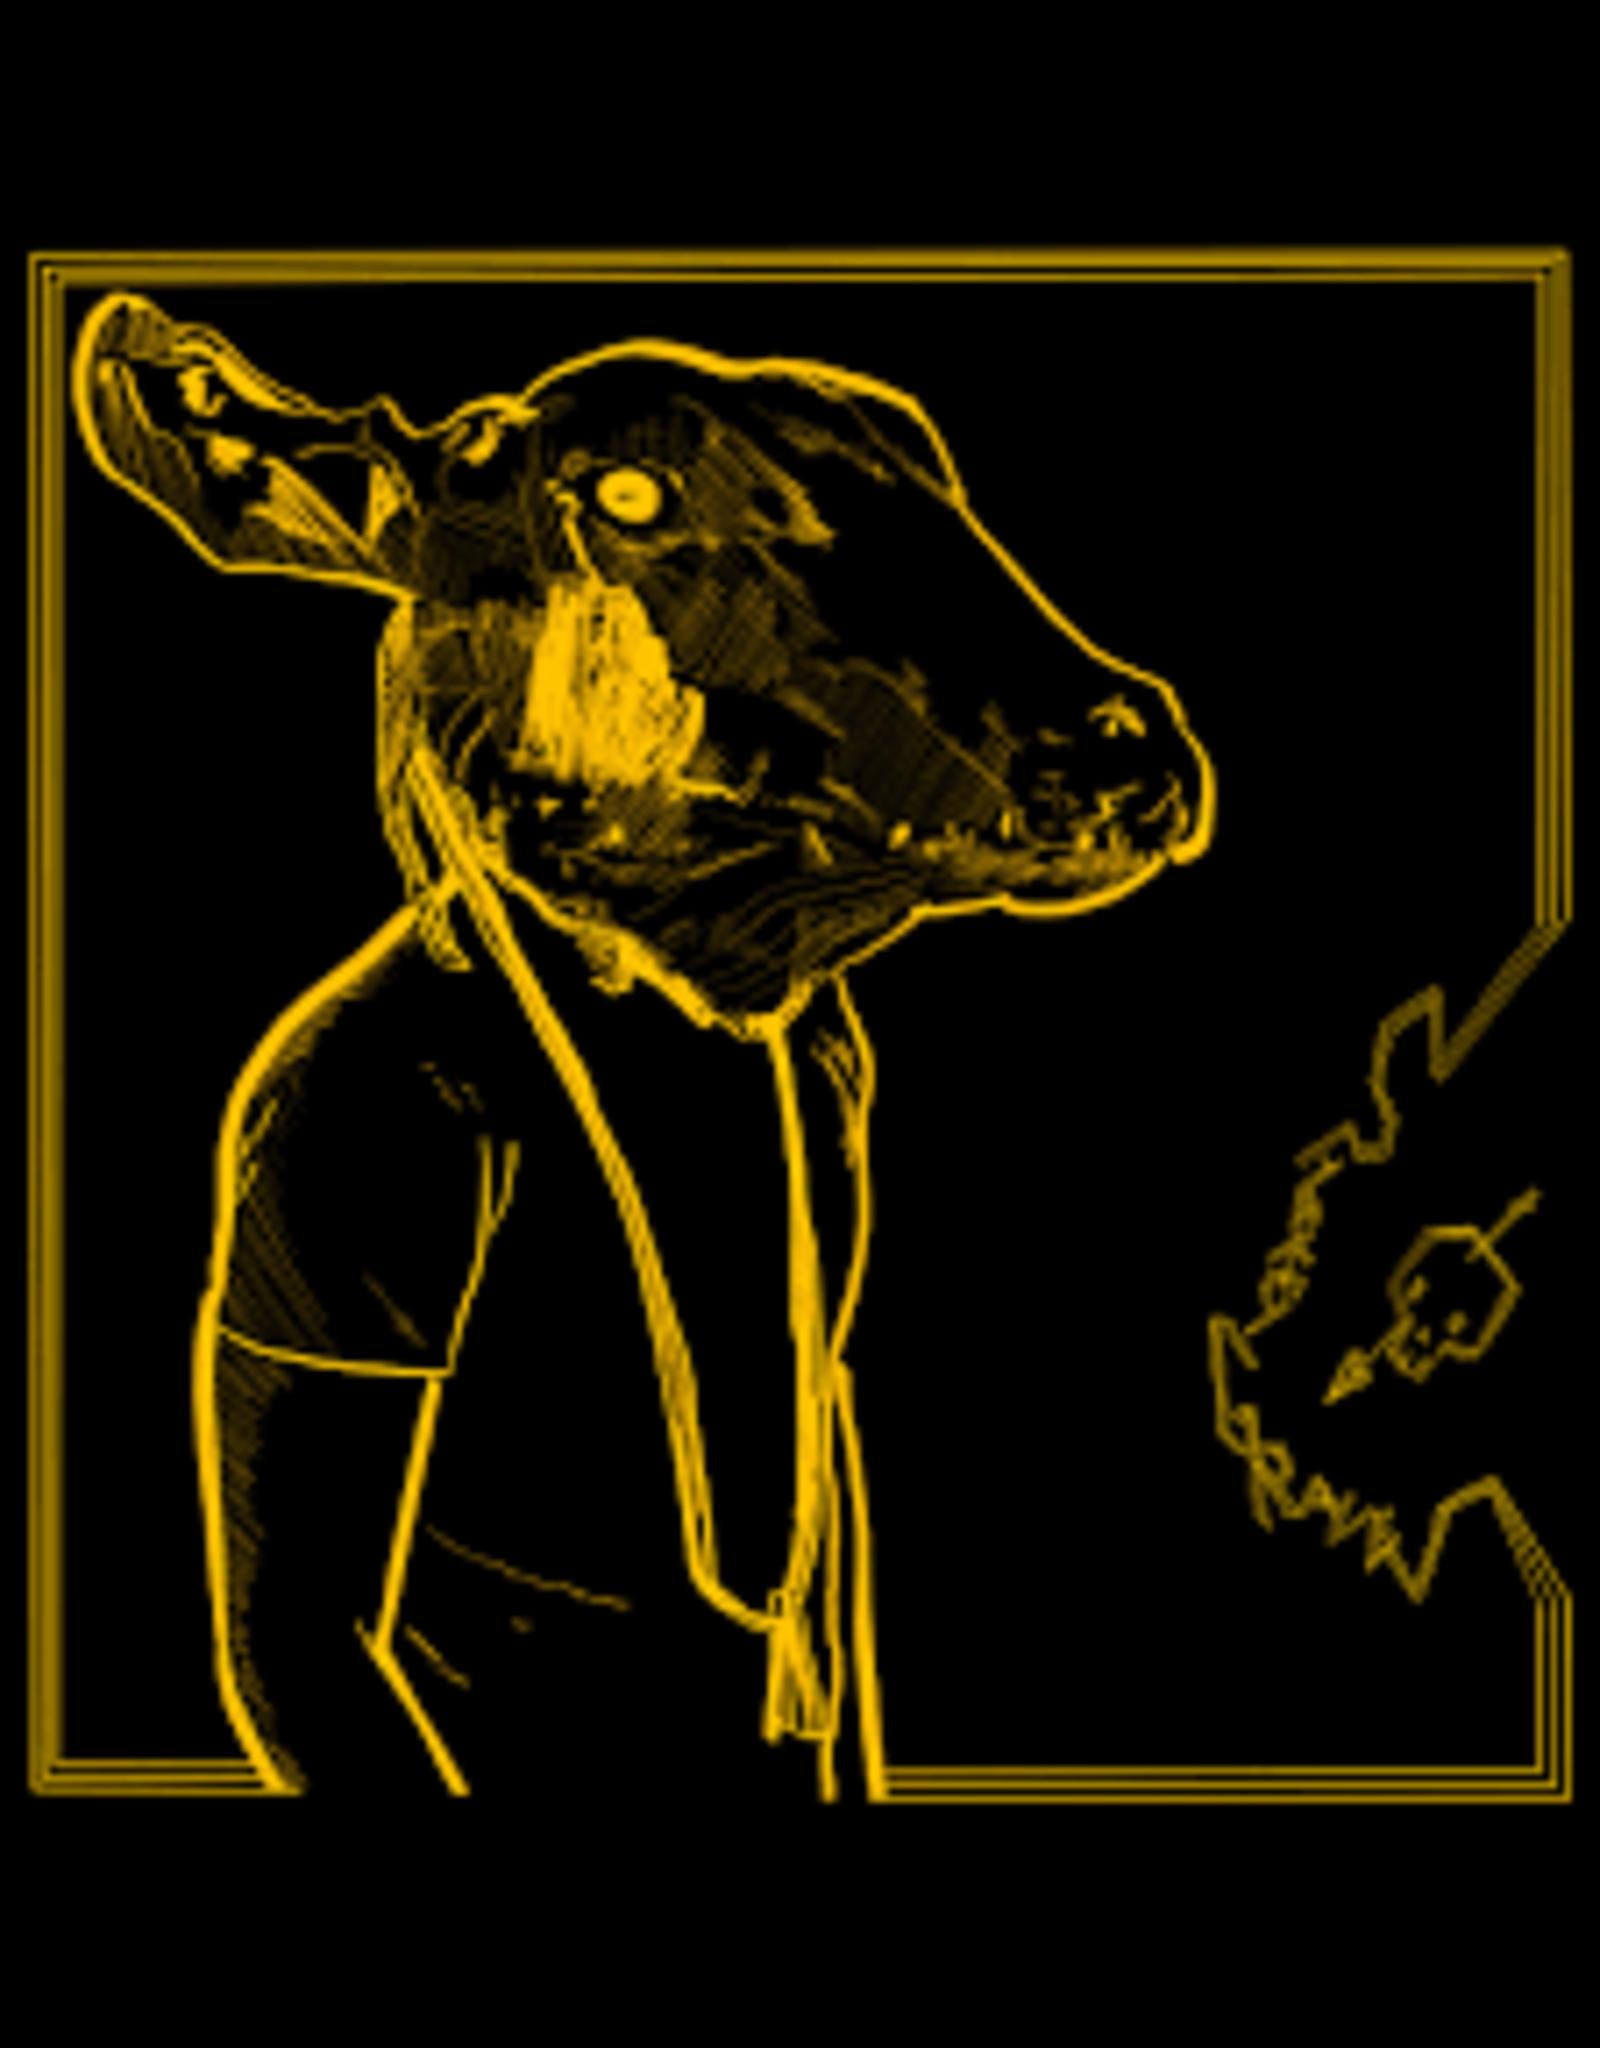 Shakey Graves - Roll the Bones 2 LP